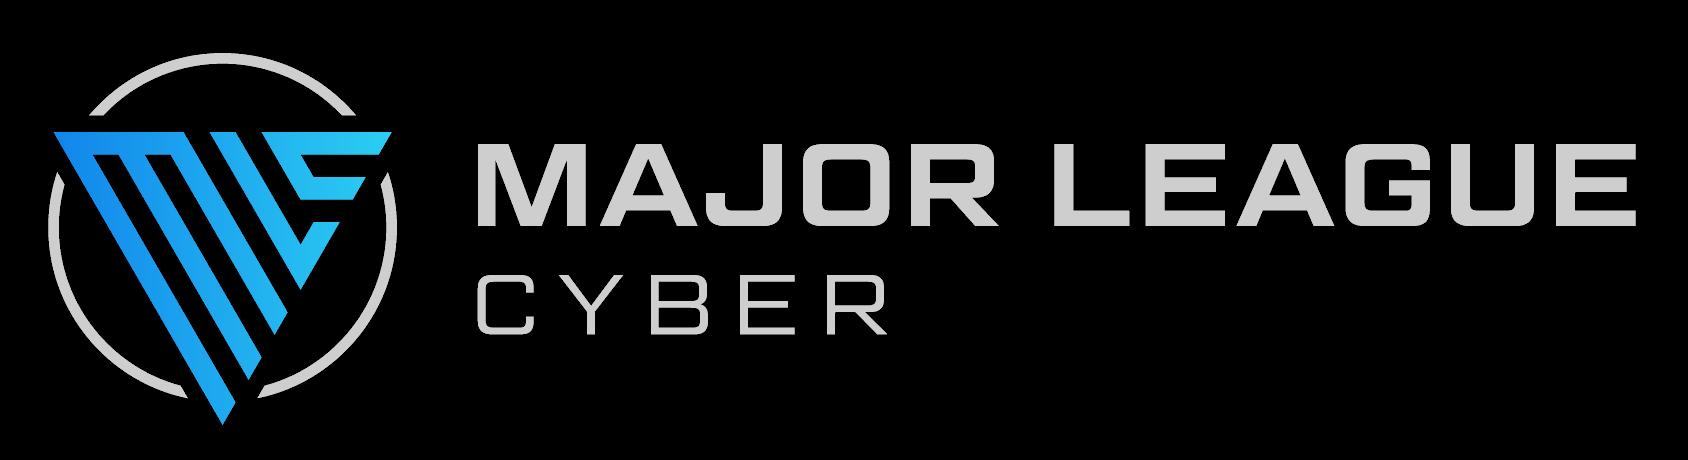 MajorLeagueCyber